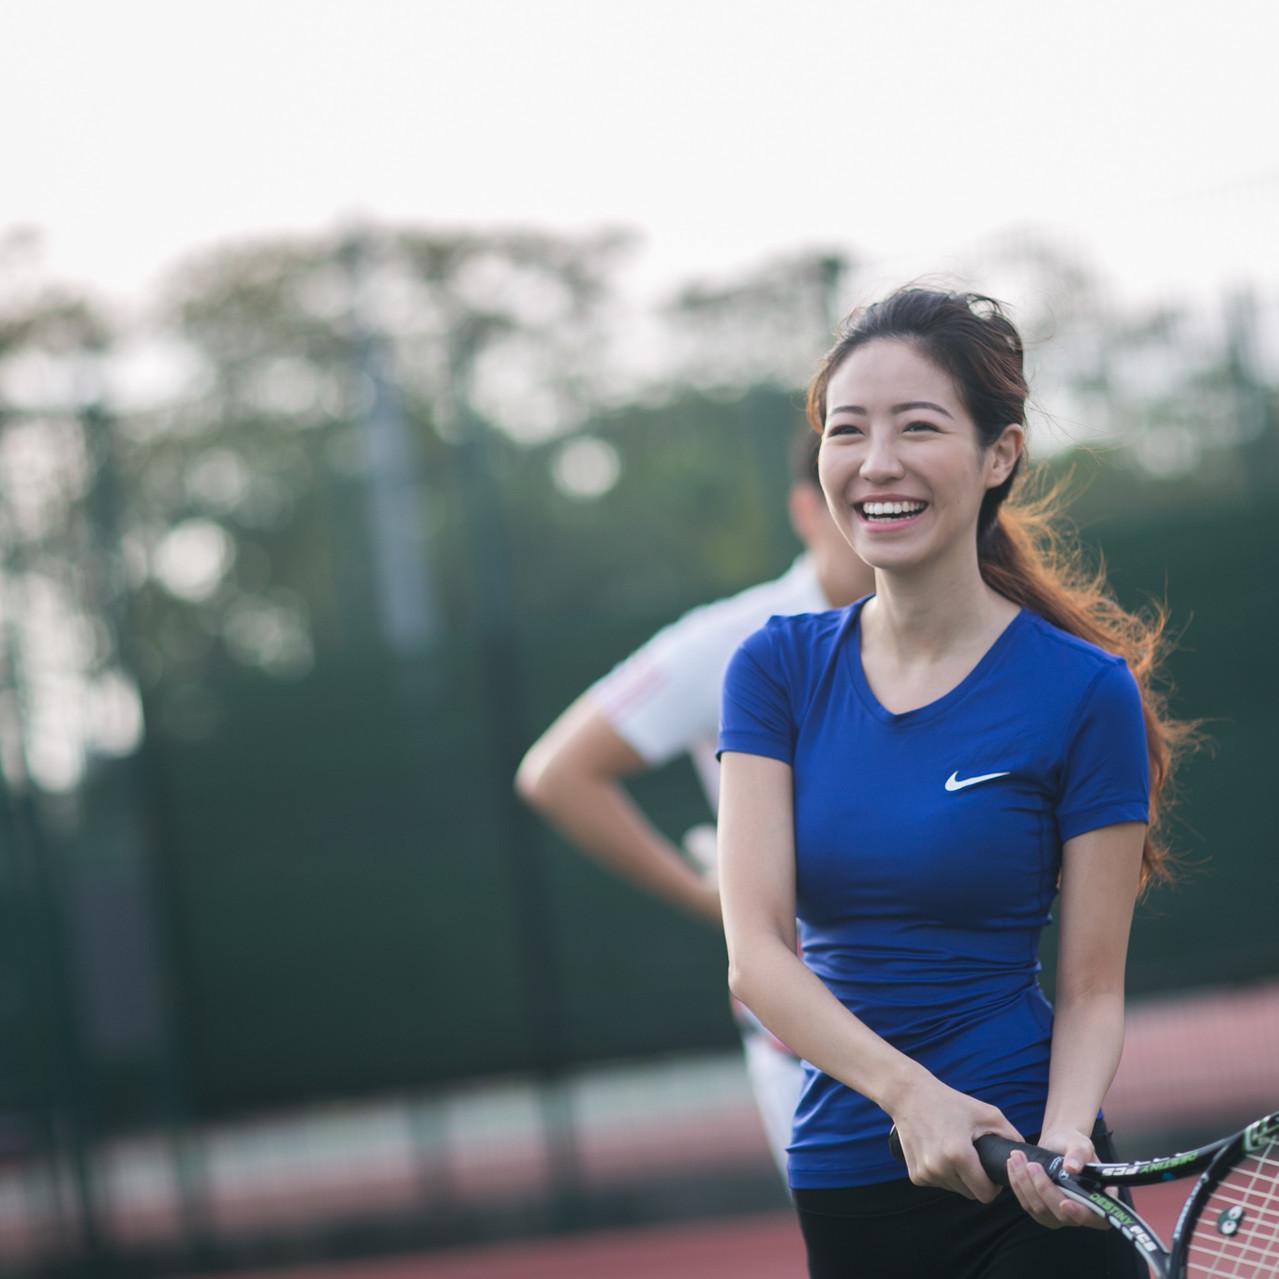 banana tennis session